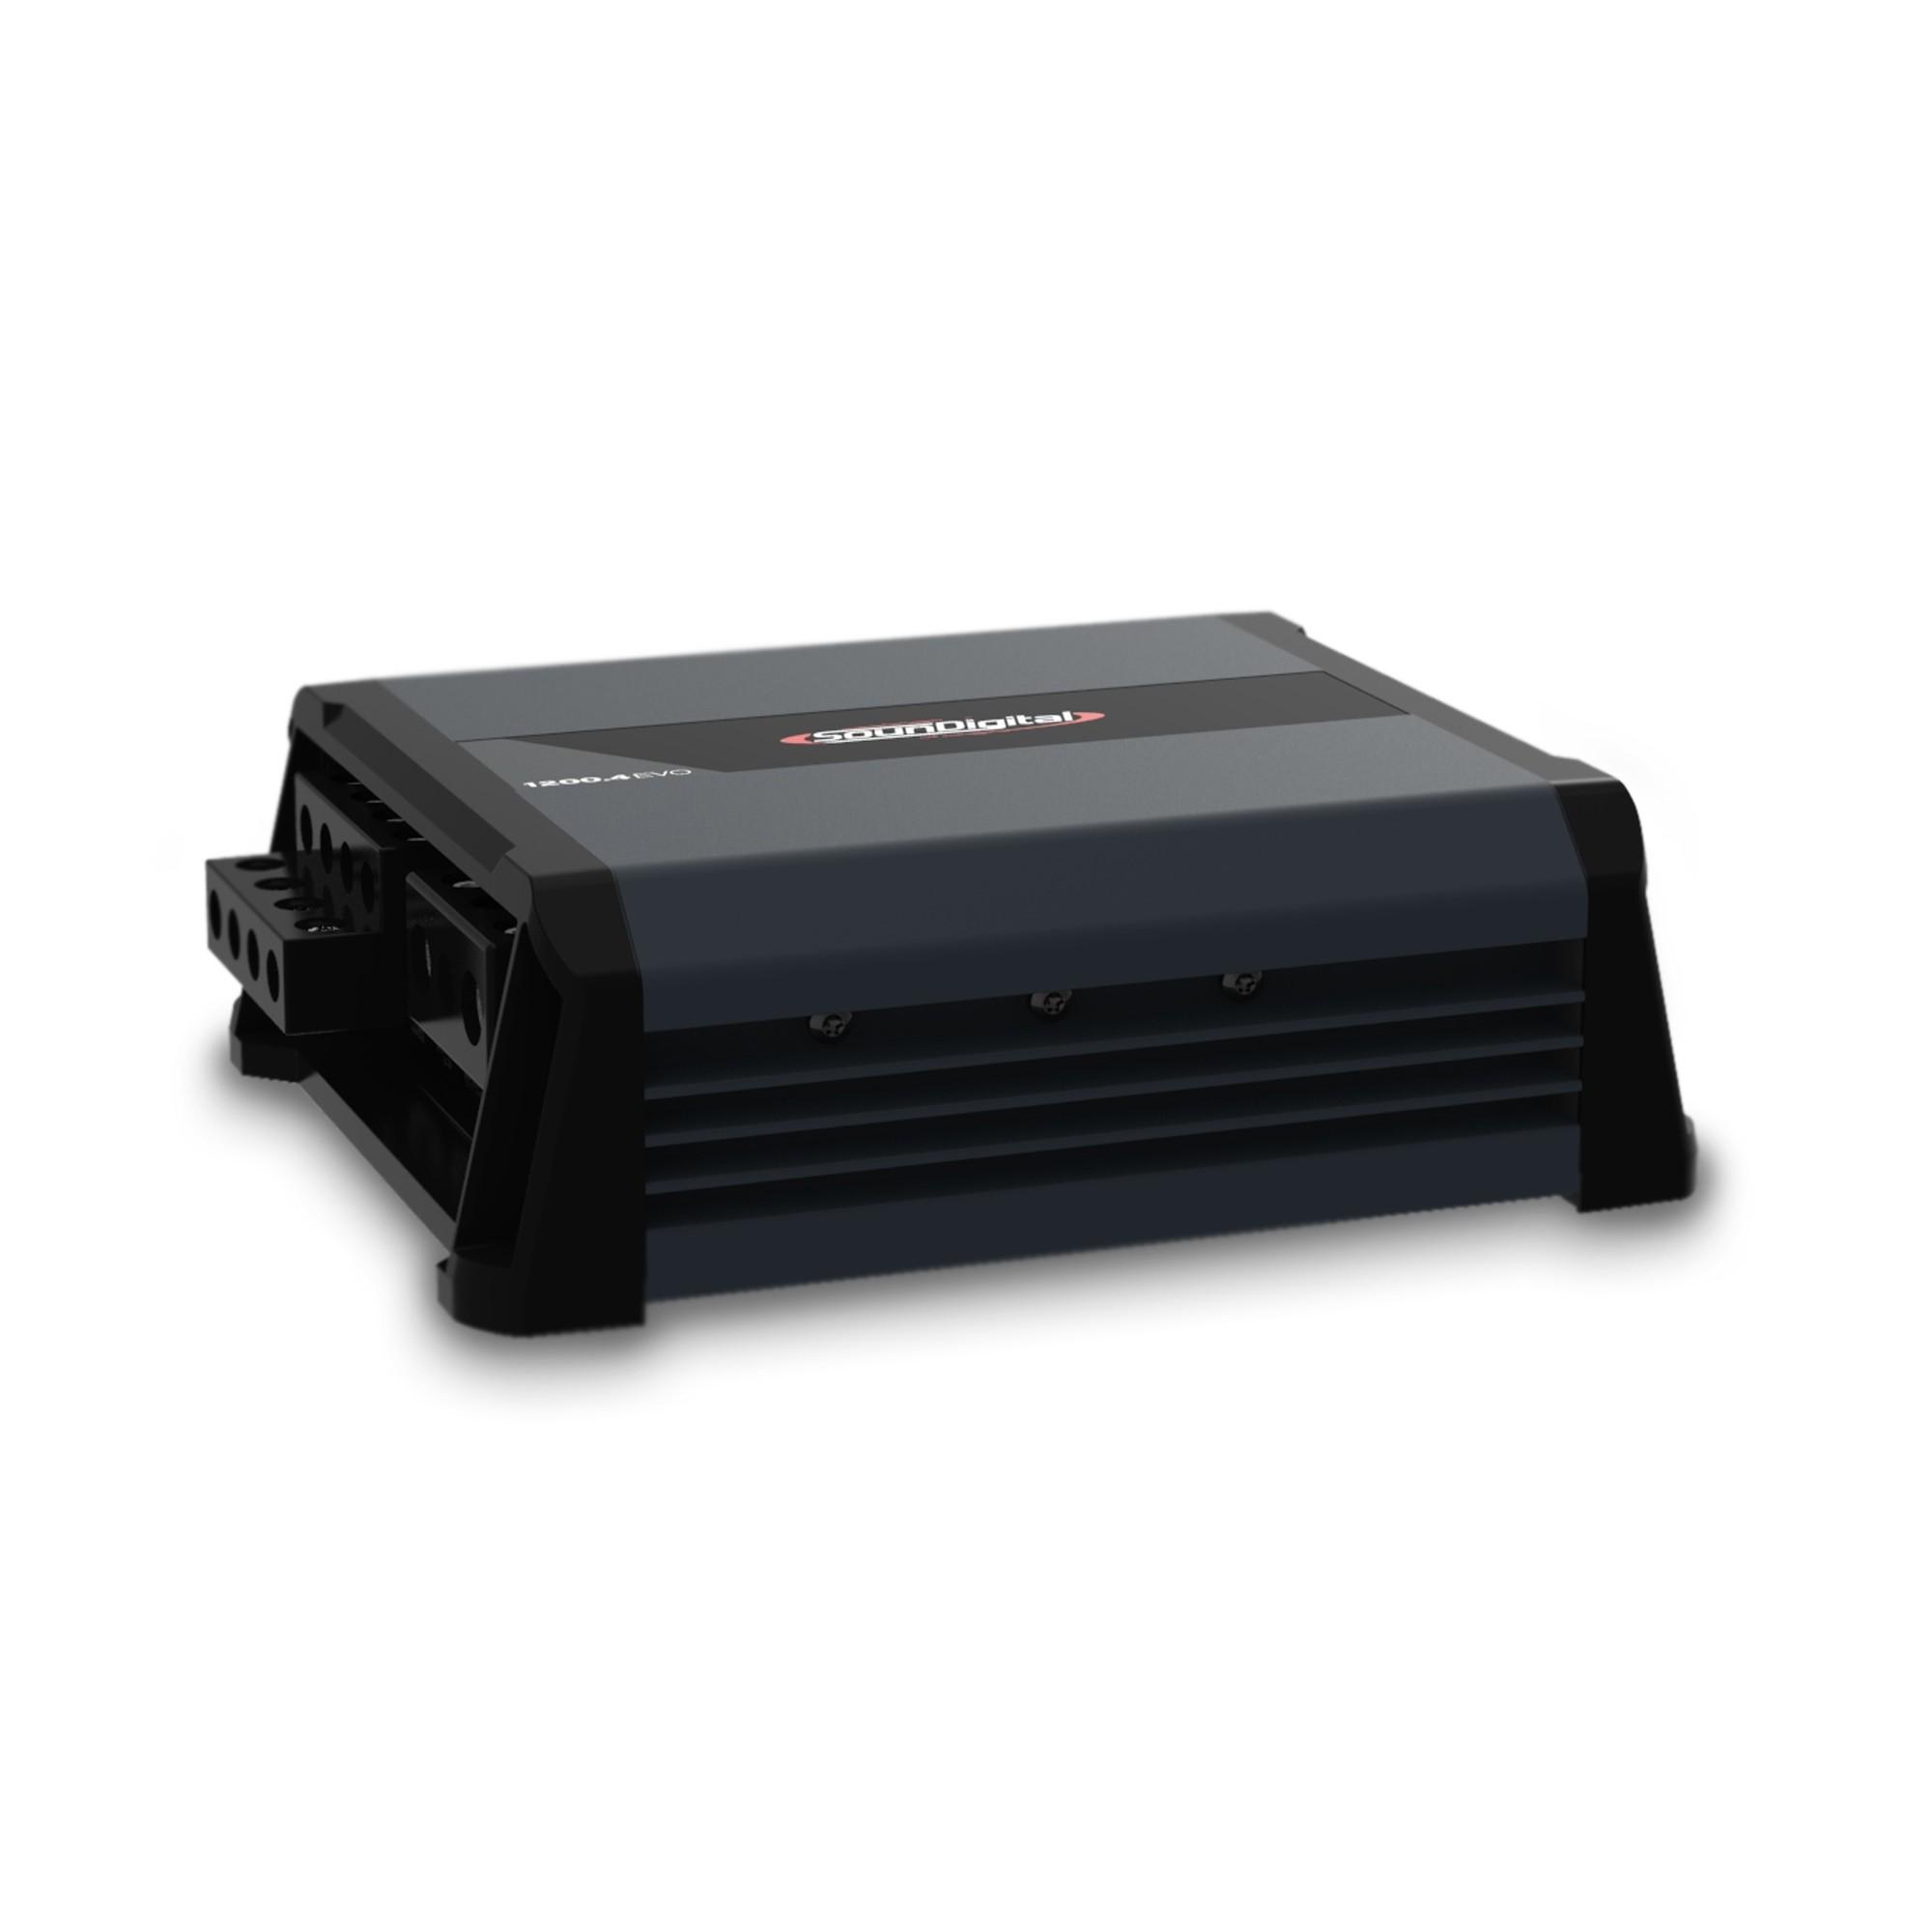 Módulo Amplificador Soundigital SD 1200.4 EVO 4.0 1200W Rms 4 Ohms 4 Canais